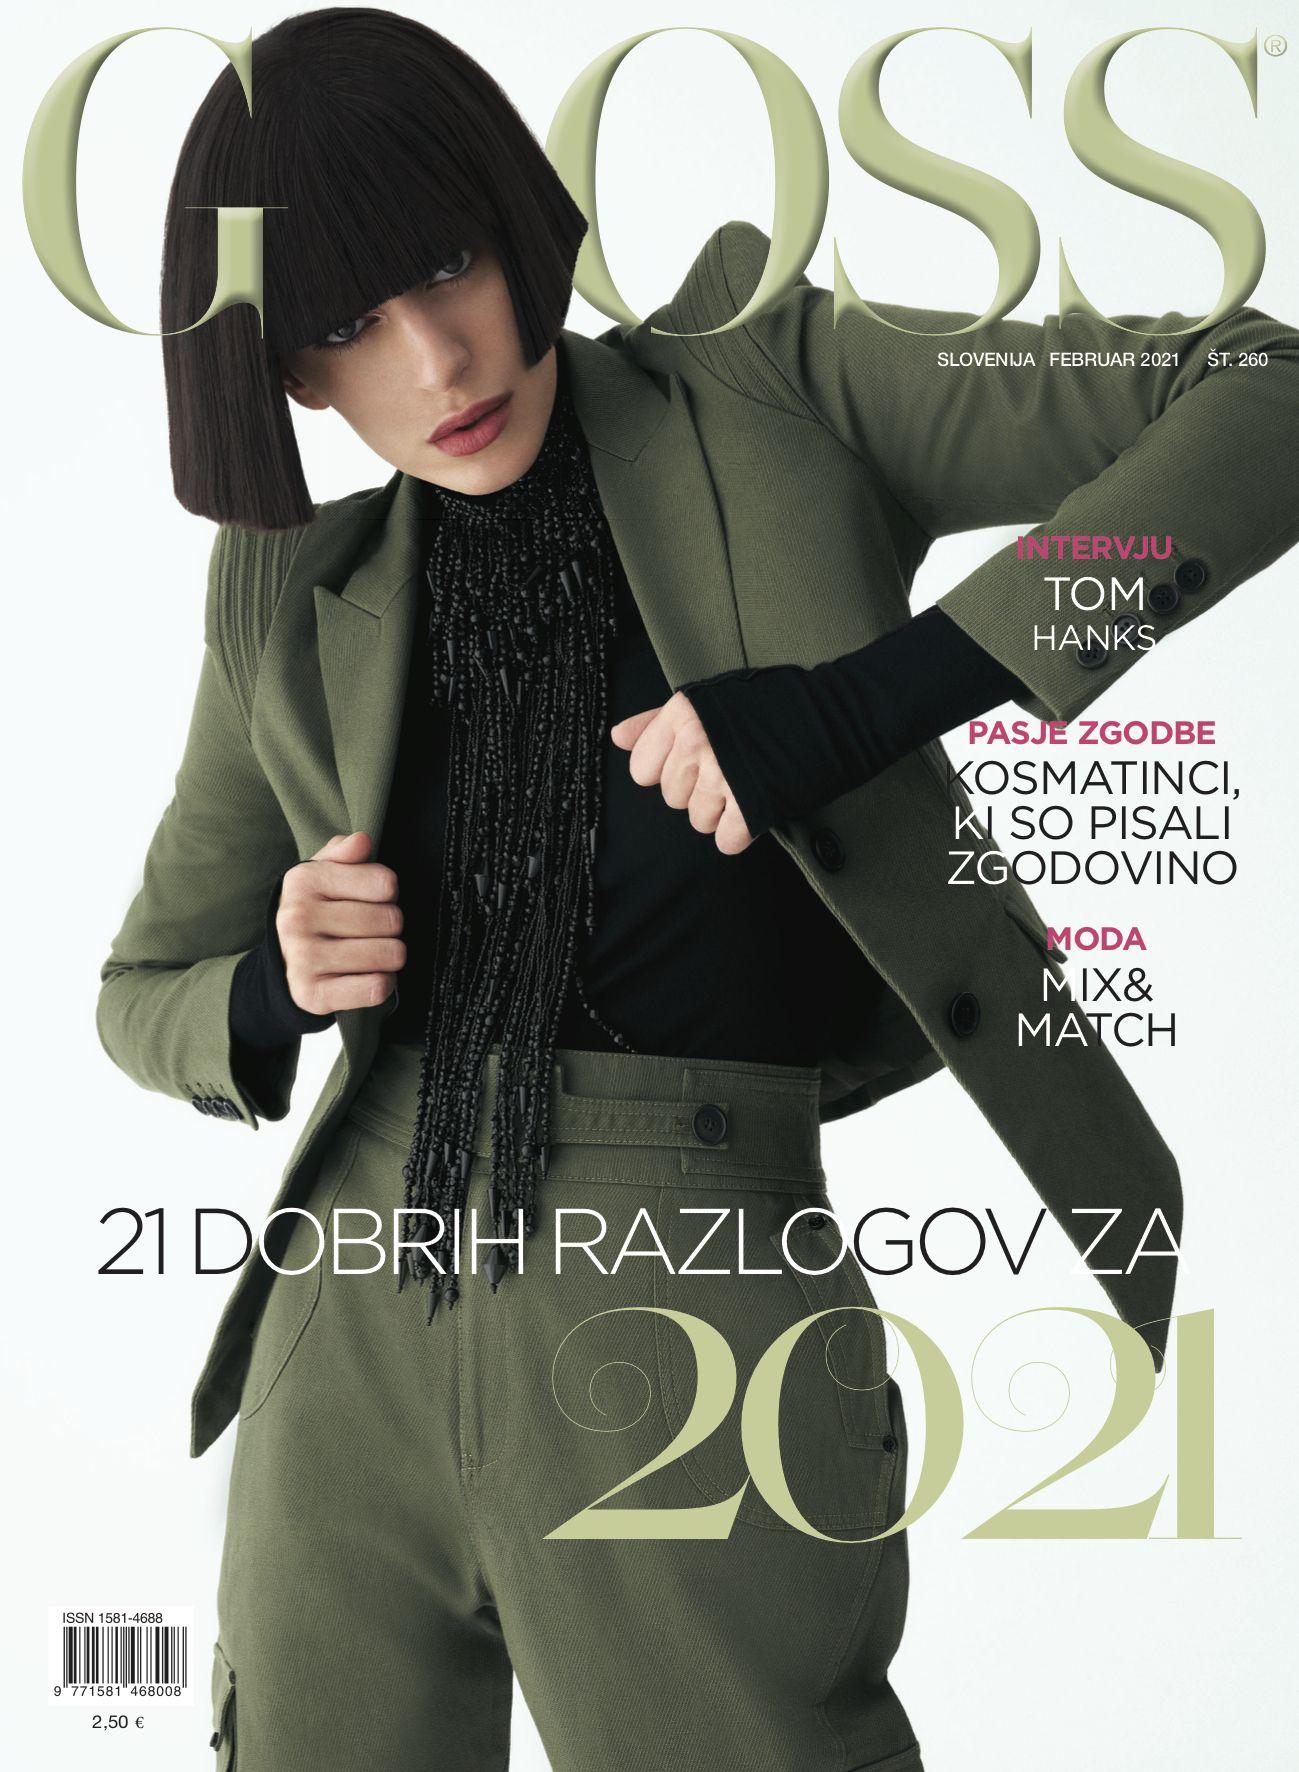 Gloss Magazine Cover - Pic. 1